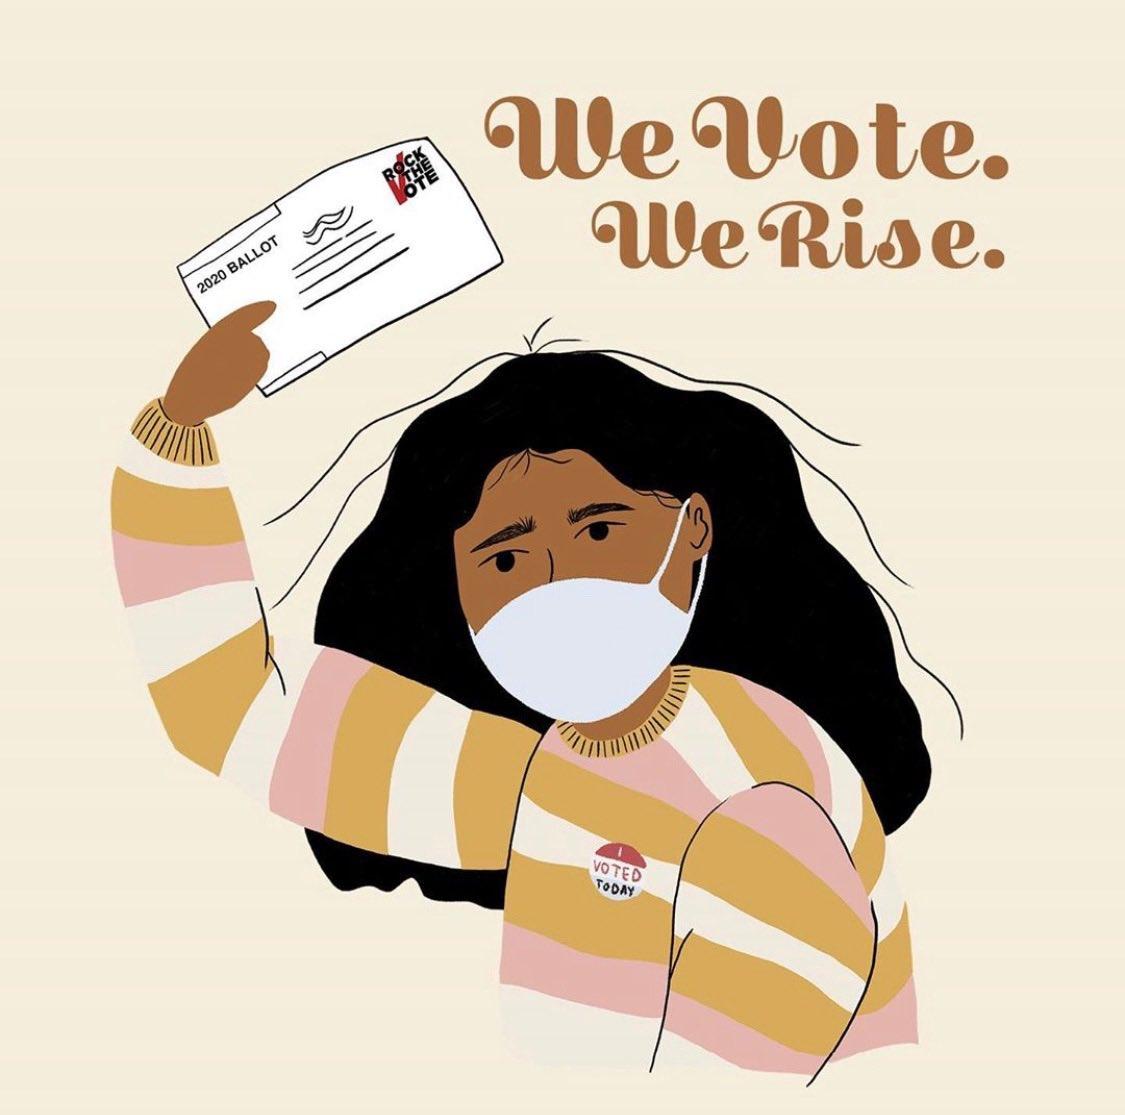 Do it safely. Do it right. #Vote  🎨: @sophillustrates via @RockTheVote https://t.co/jeKkav3d0x